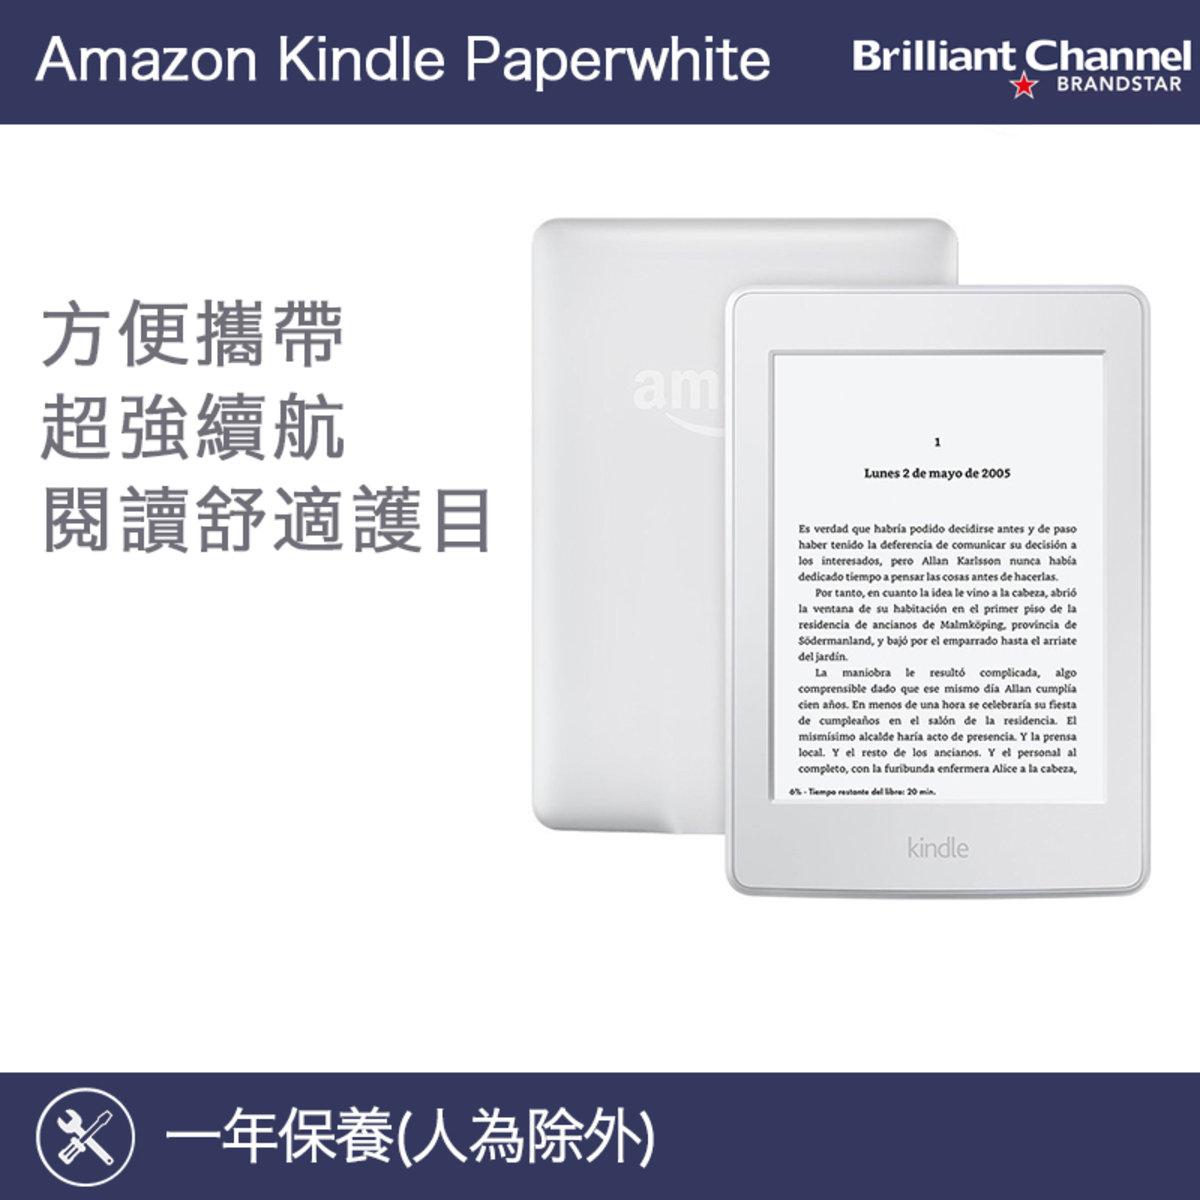 AMAZON   Kindle Paperwhite 7th Generation White WIFI USA version (1